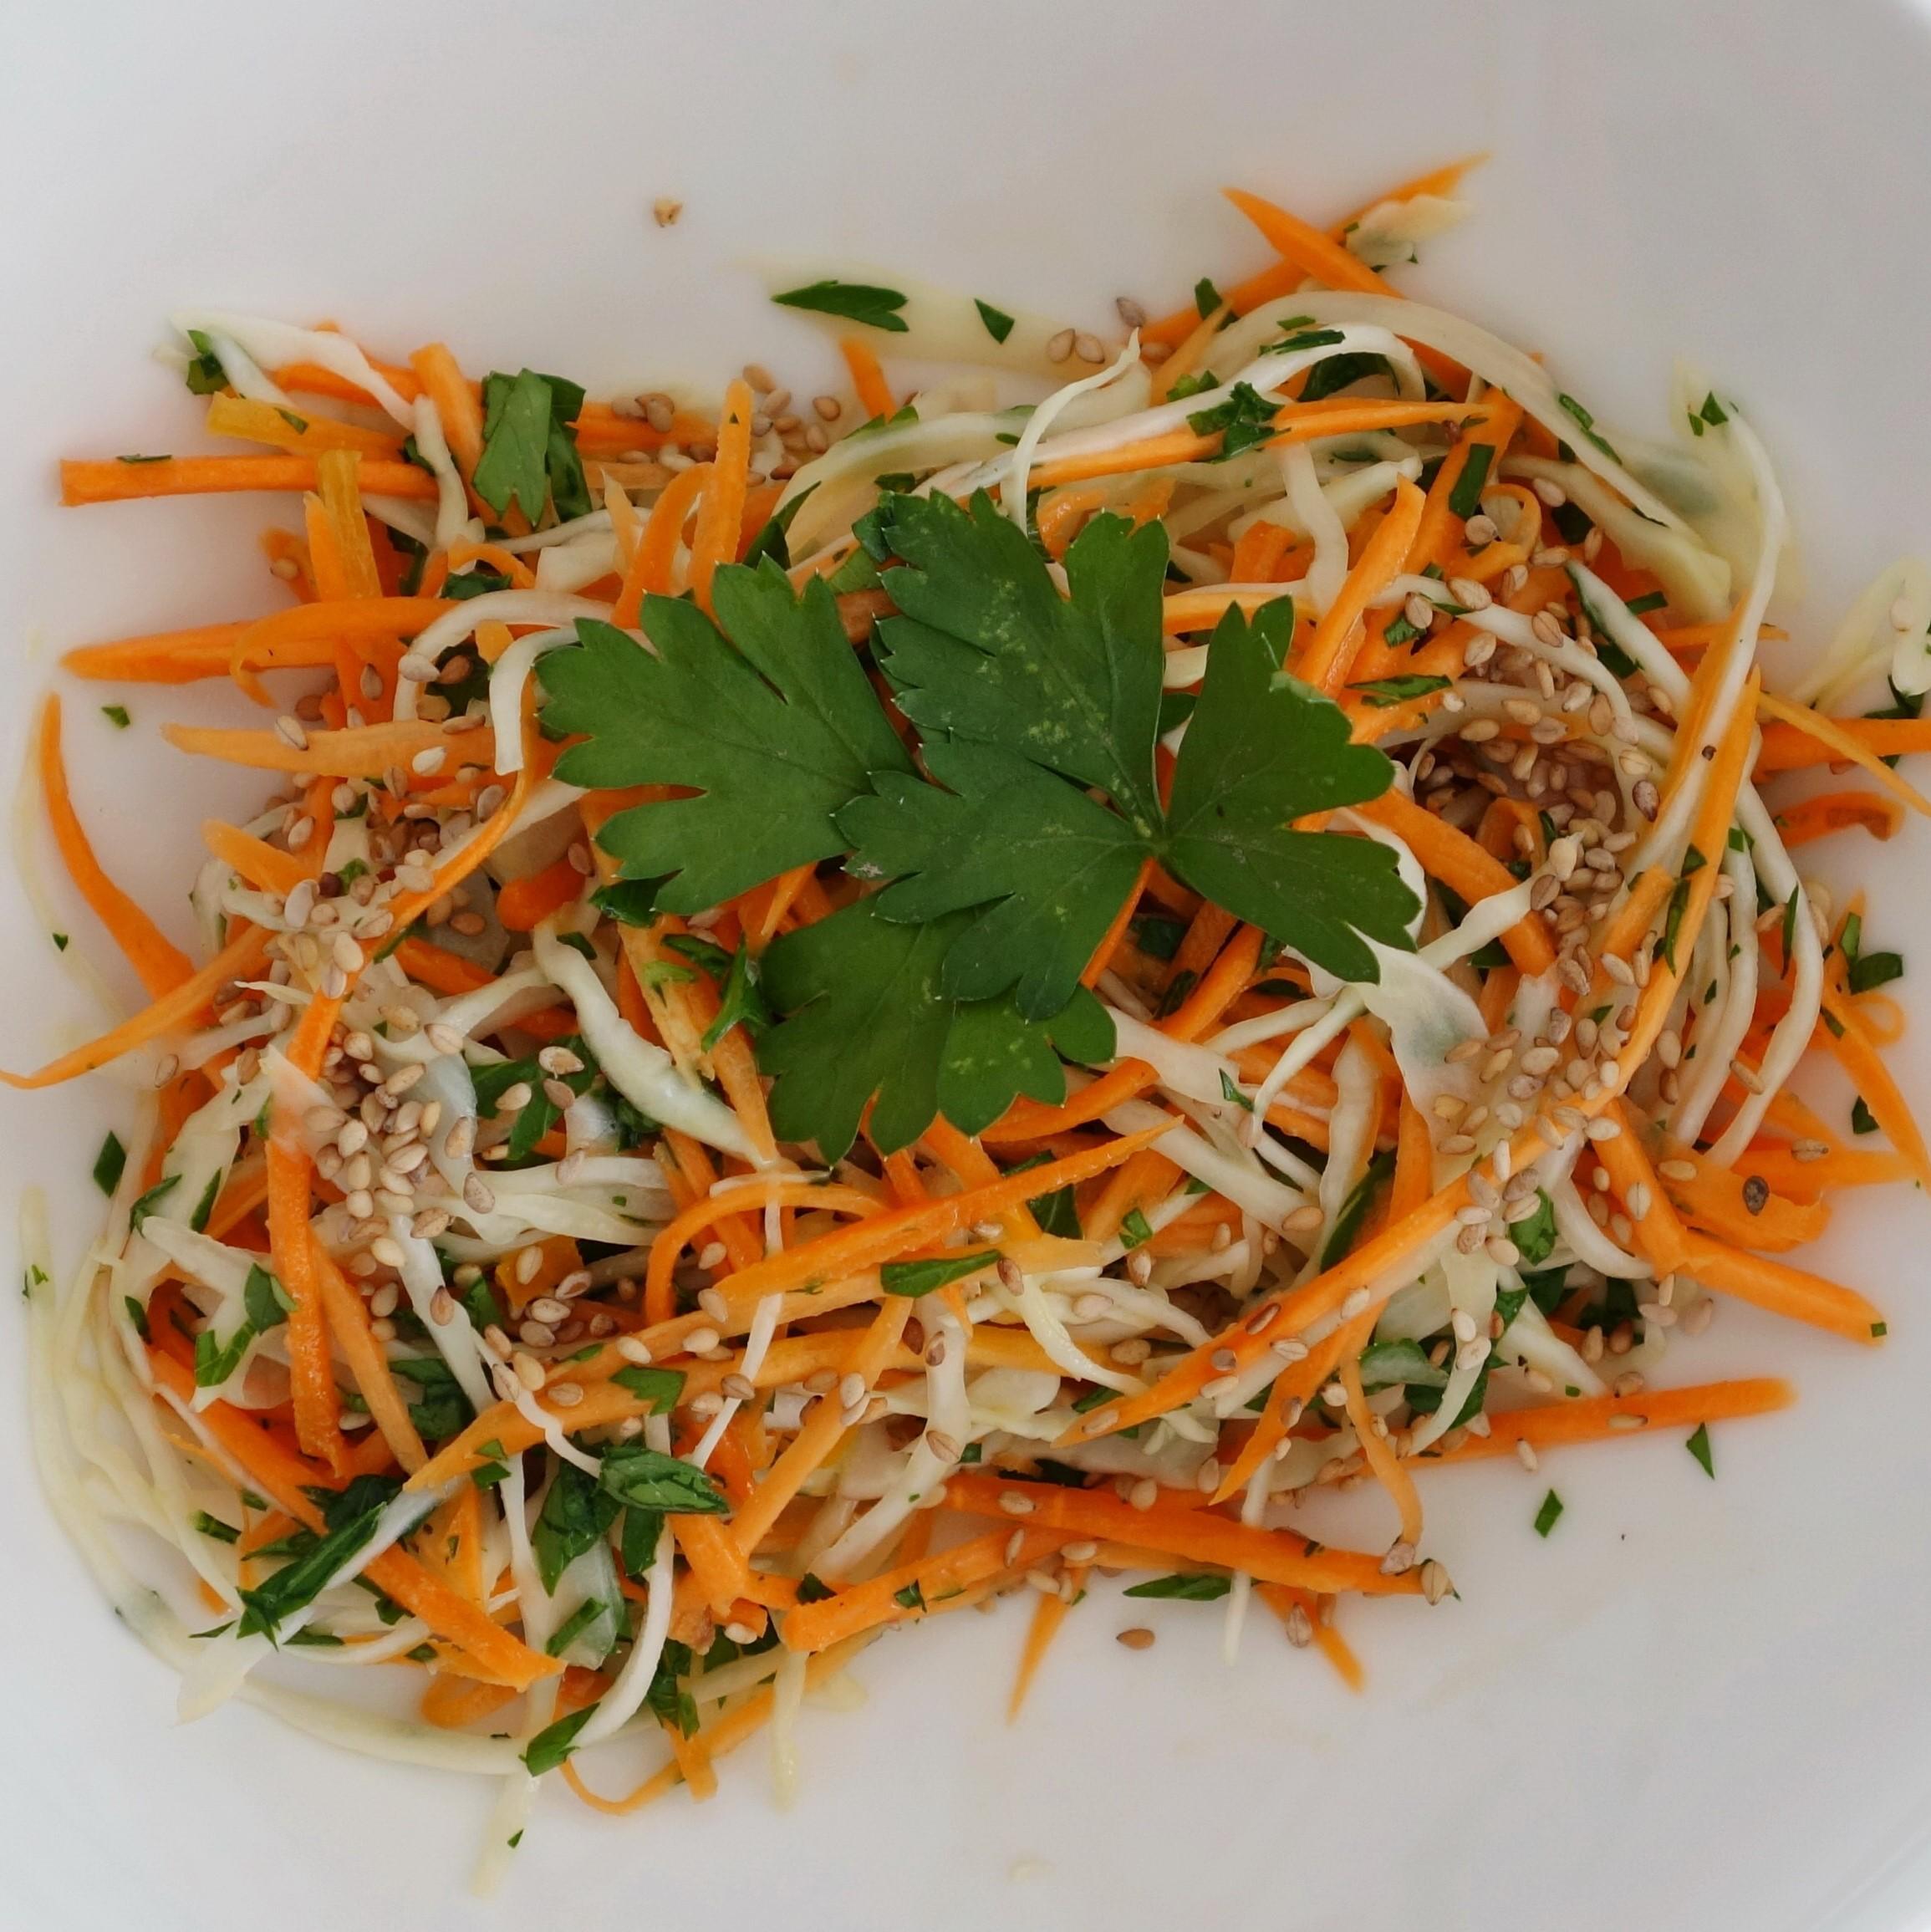 Karotten Spitzkohl Salat DSC05467a.JPG